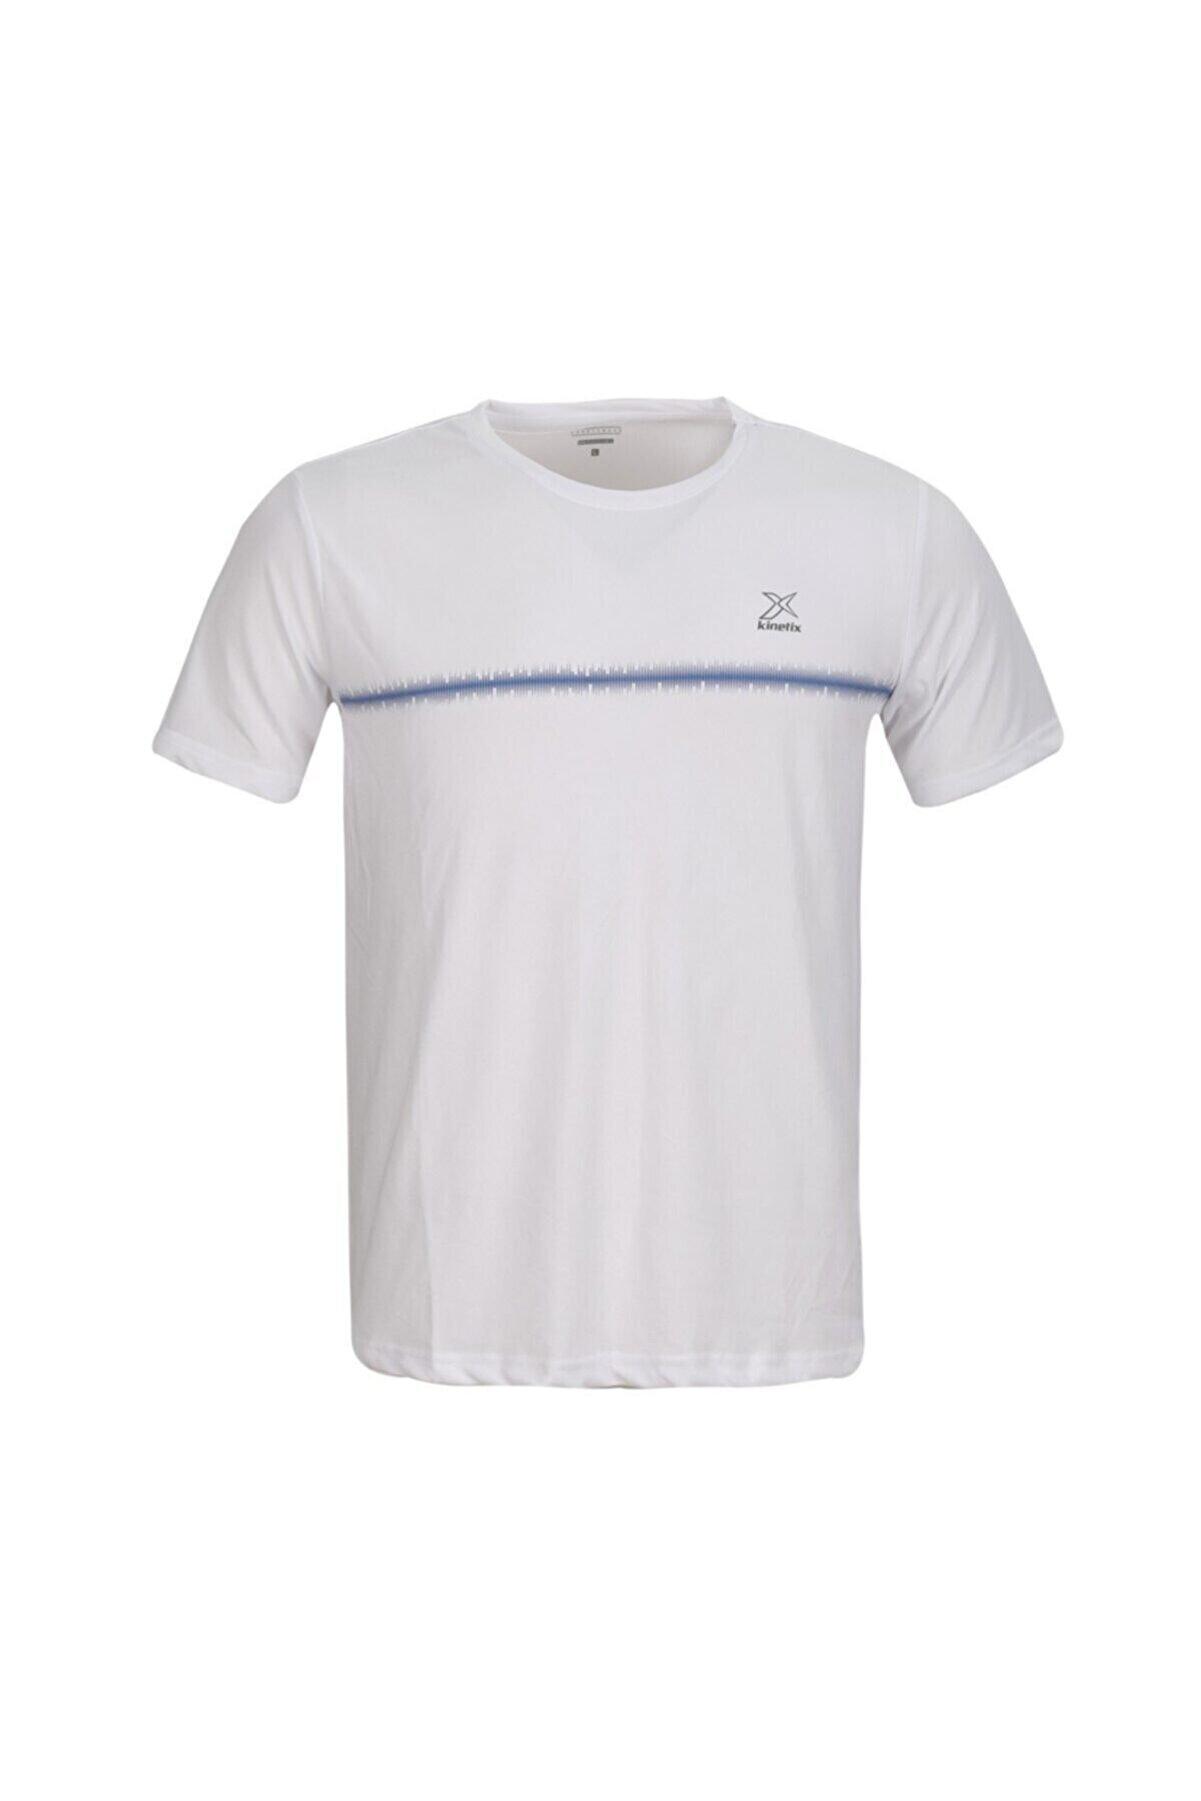 Kinetix SN262 EDDY T-SHIRT Beyaz Erkek T-Shirt 100581681